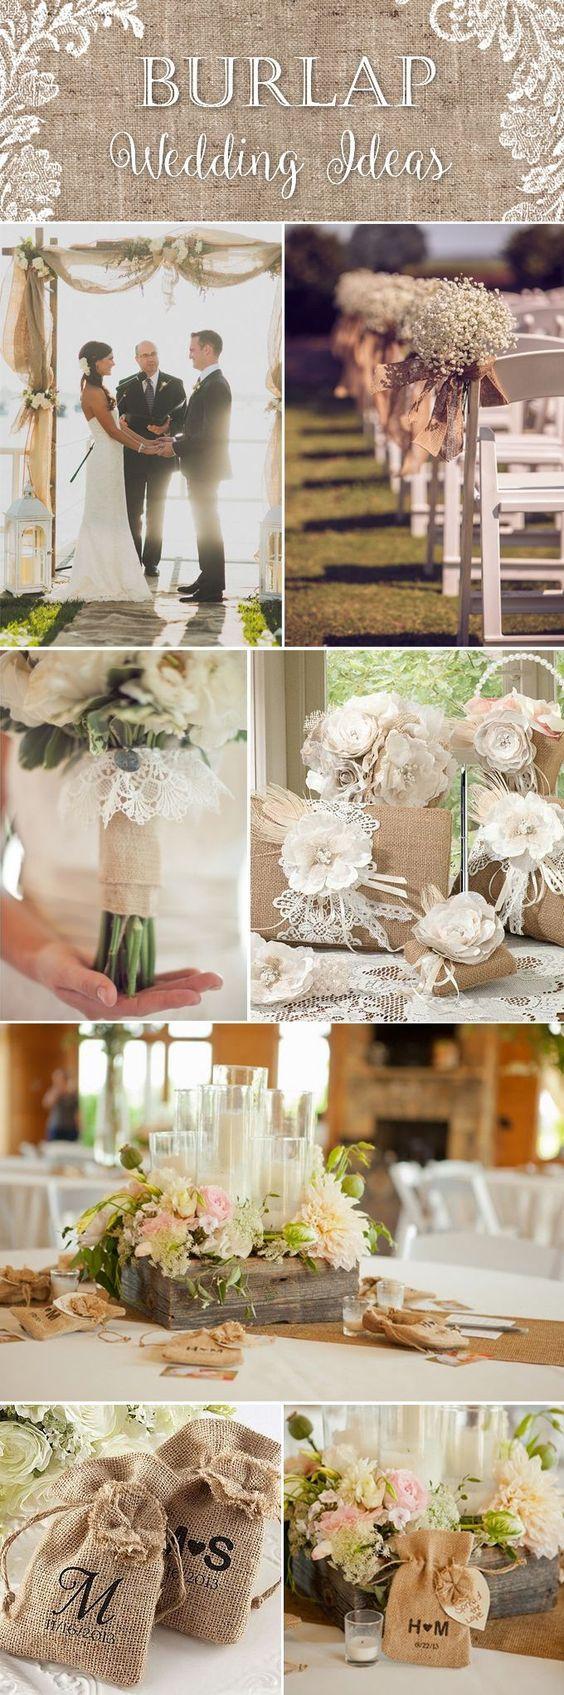 best 25 burlap wedding decorations ideas on pinterest wedding crafts country wedding. Black Bedroom Furniture Sets. Home Design Ideas